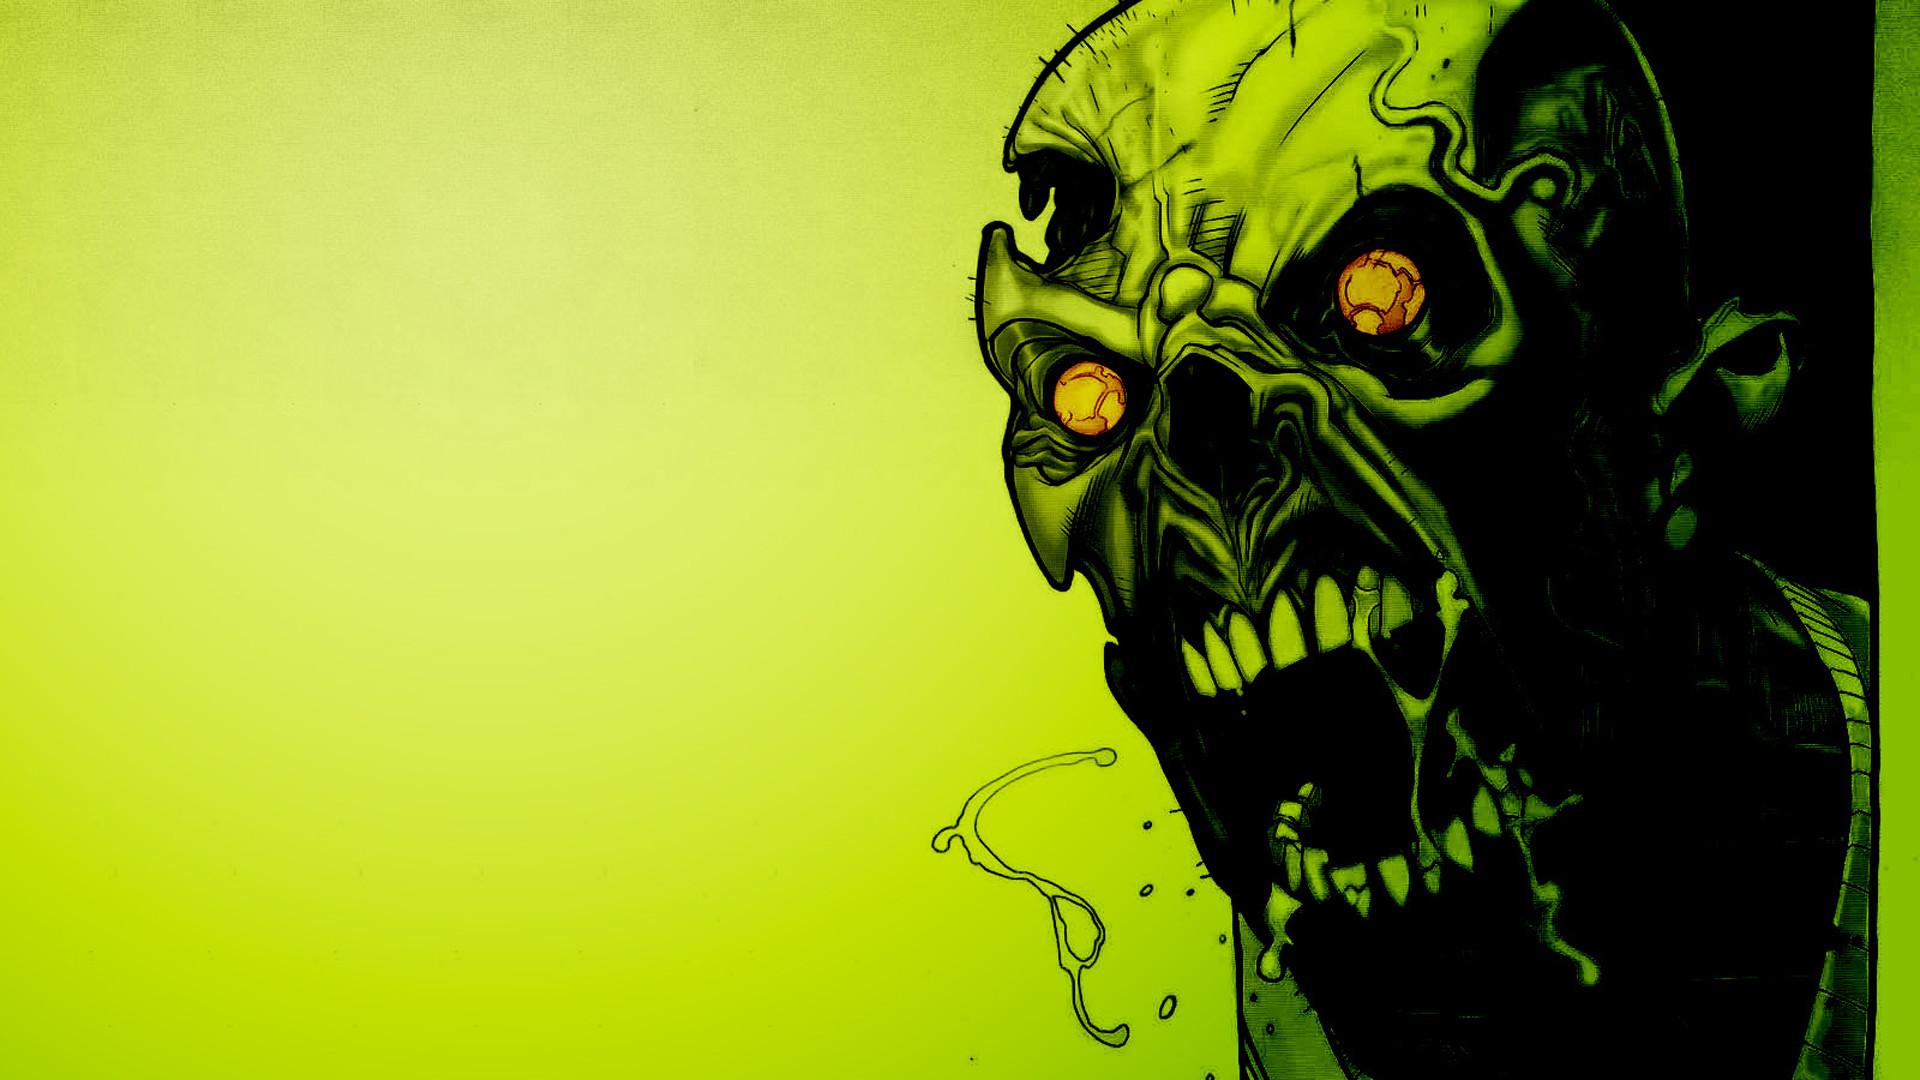 Latest Zombie Wallpaper